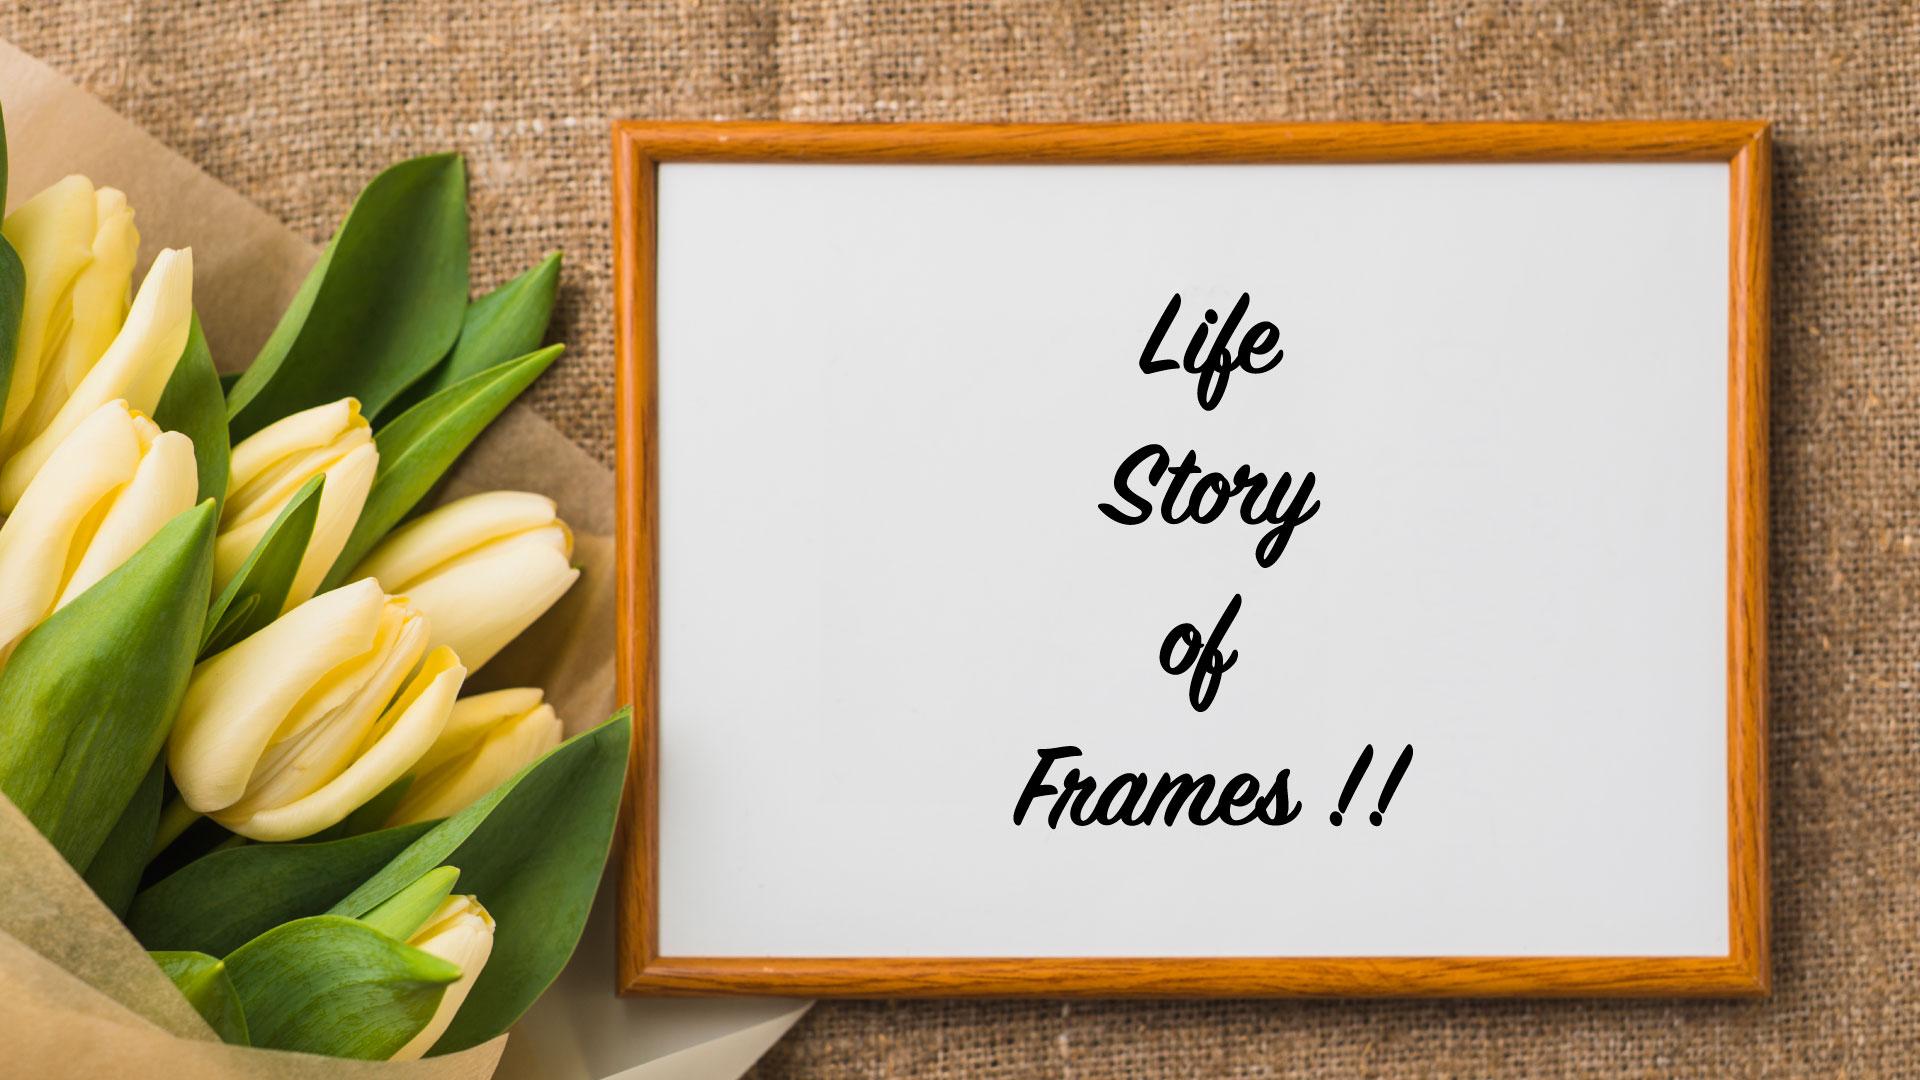 For frames in Abu Dhabi or framing Abu Dhabi